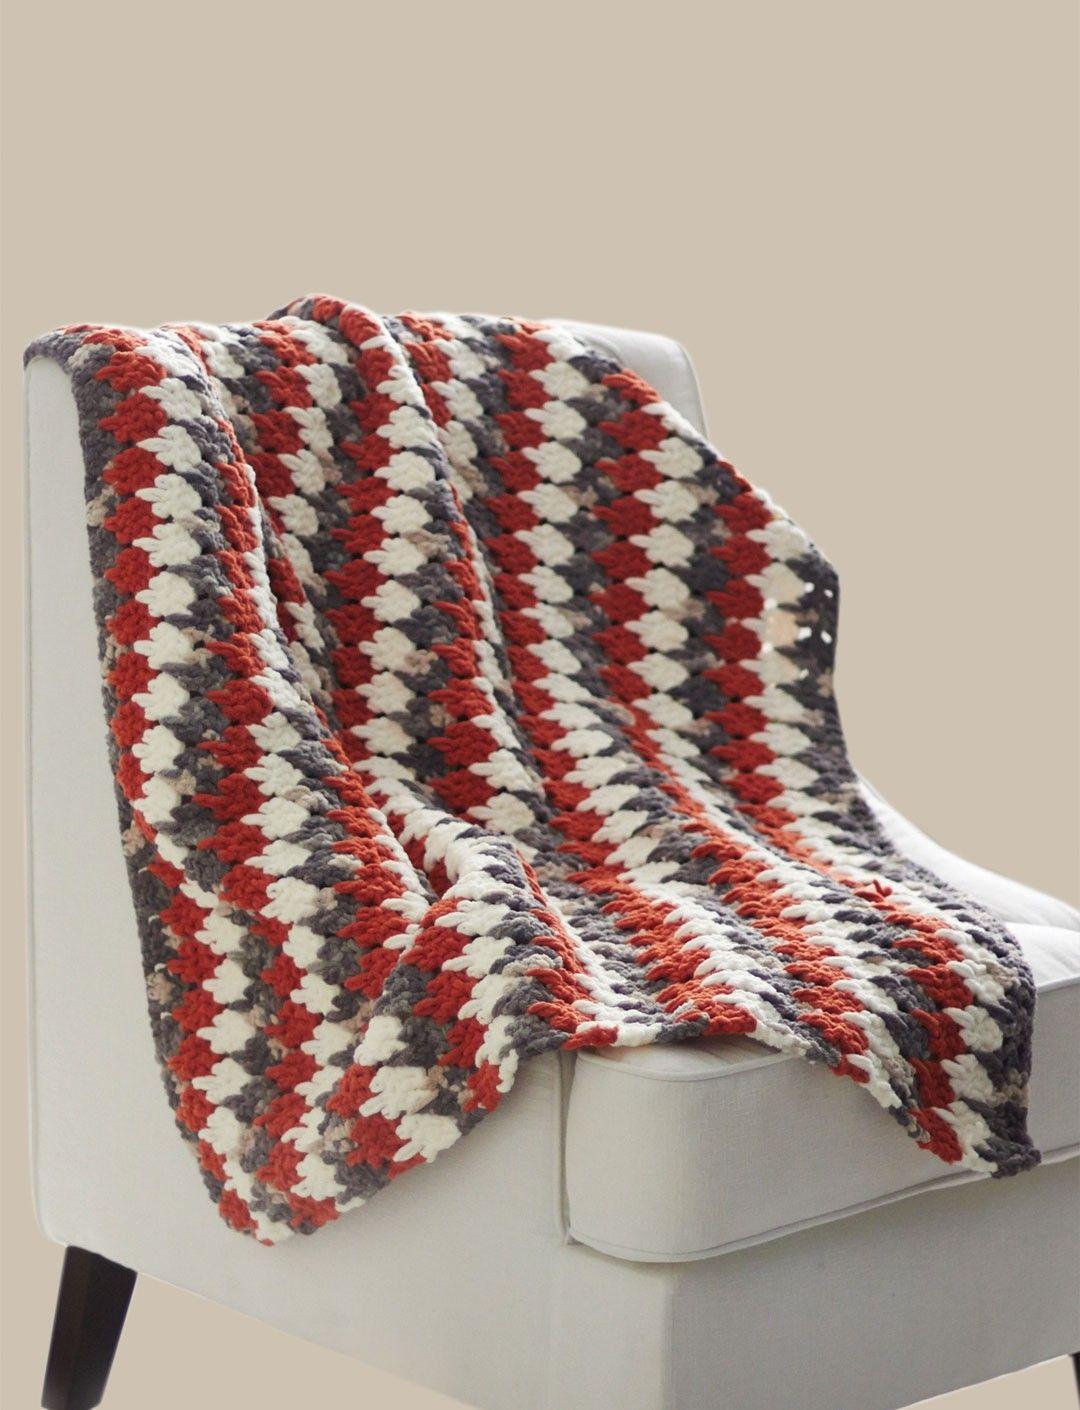 Yarnspirations bernatlarksfootblanket patterns free bankloansurffo Image collections